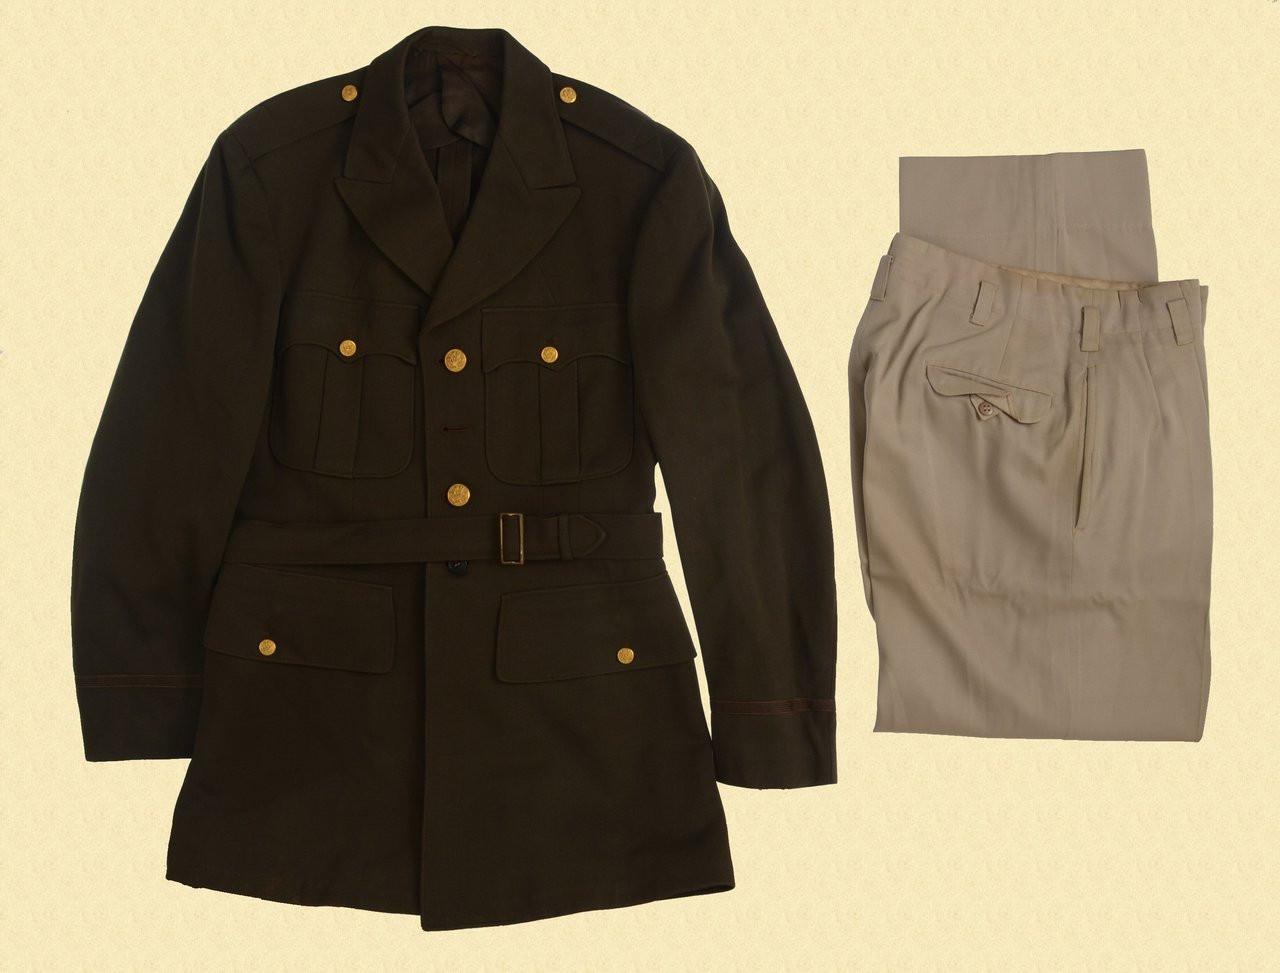 U.S. WW2 OFFICERS DRESS UNIFORM - C28948